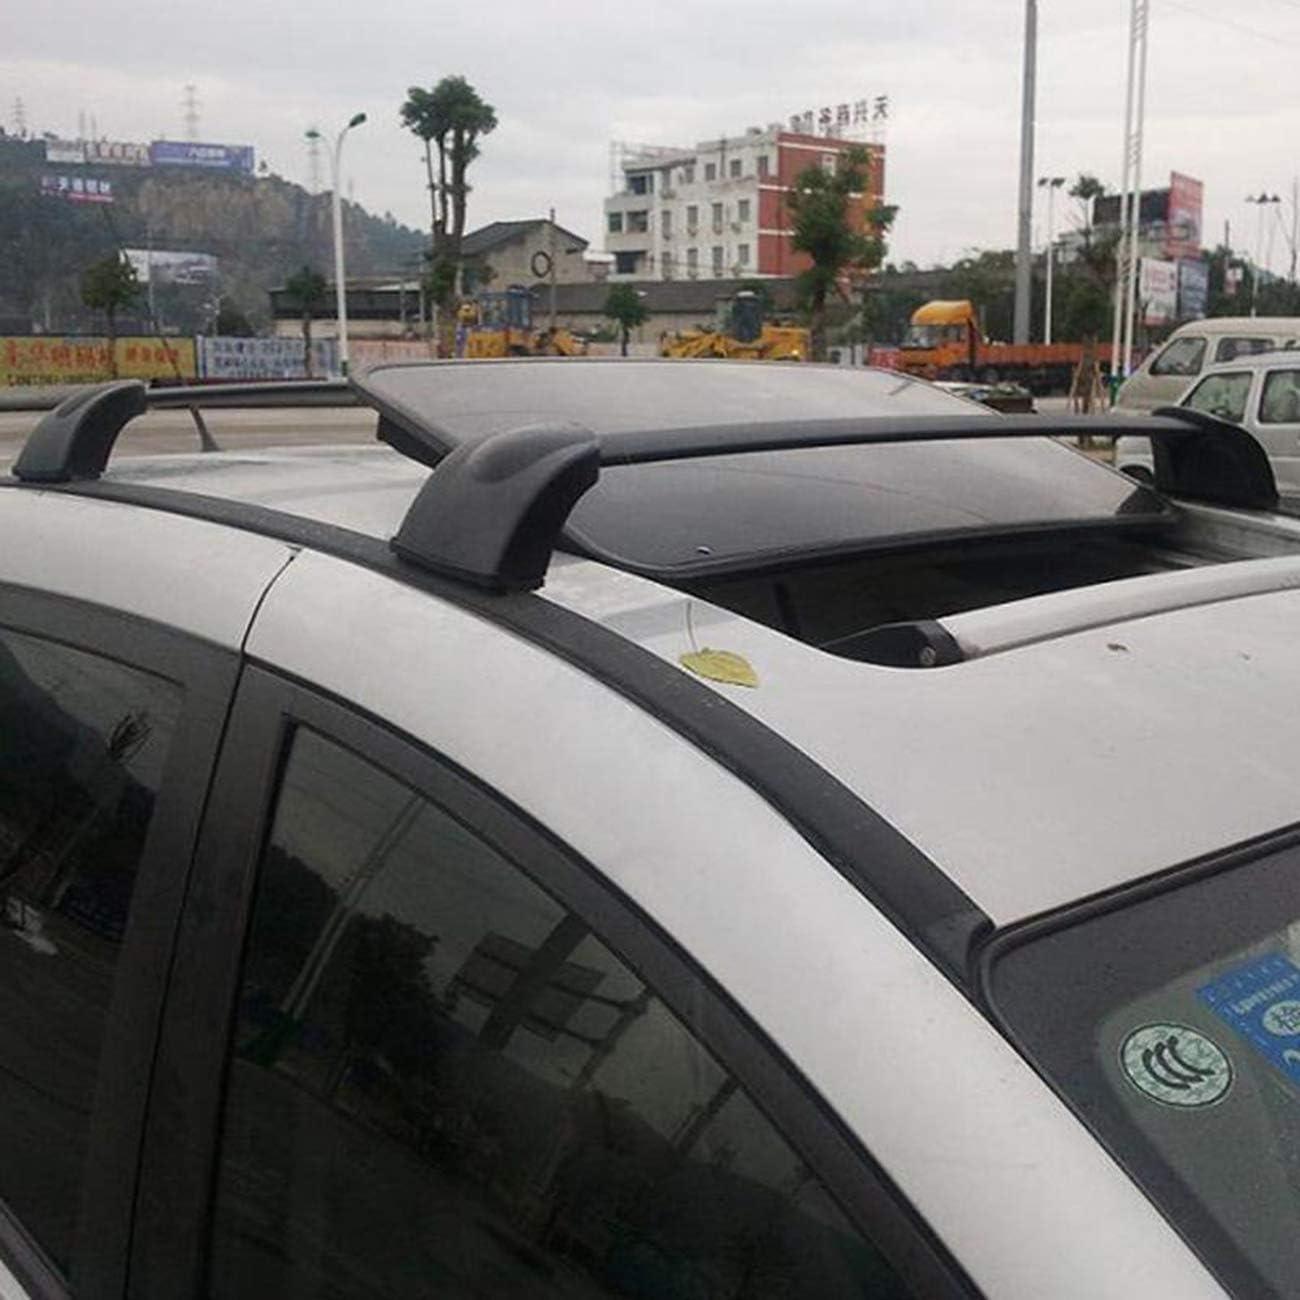 OE Style Roof Rail Cross Bars ALAVENTE Roof Rack Crossbars for 2007 2008 2009 2010 2011 2012 Mazda CX-7